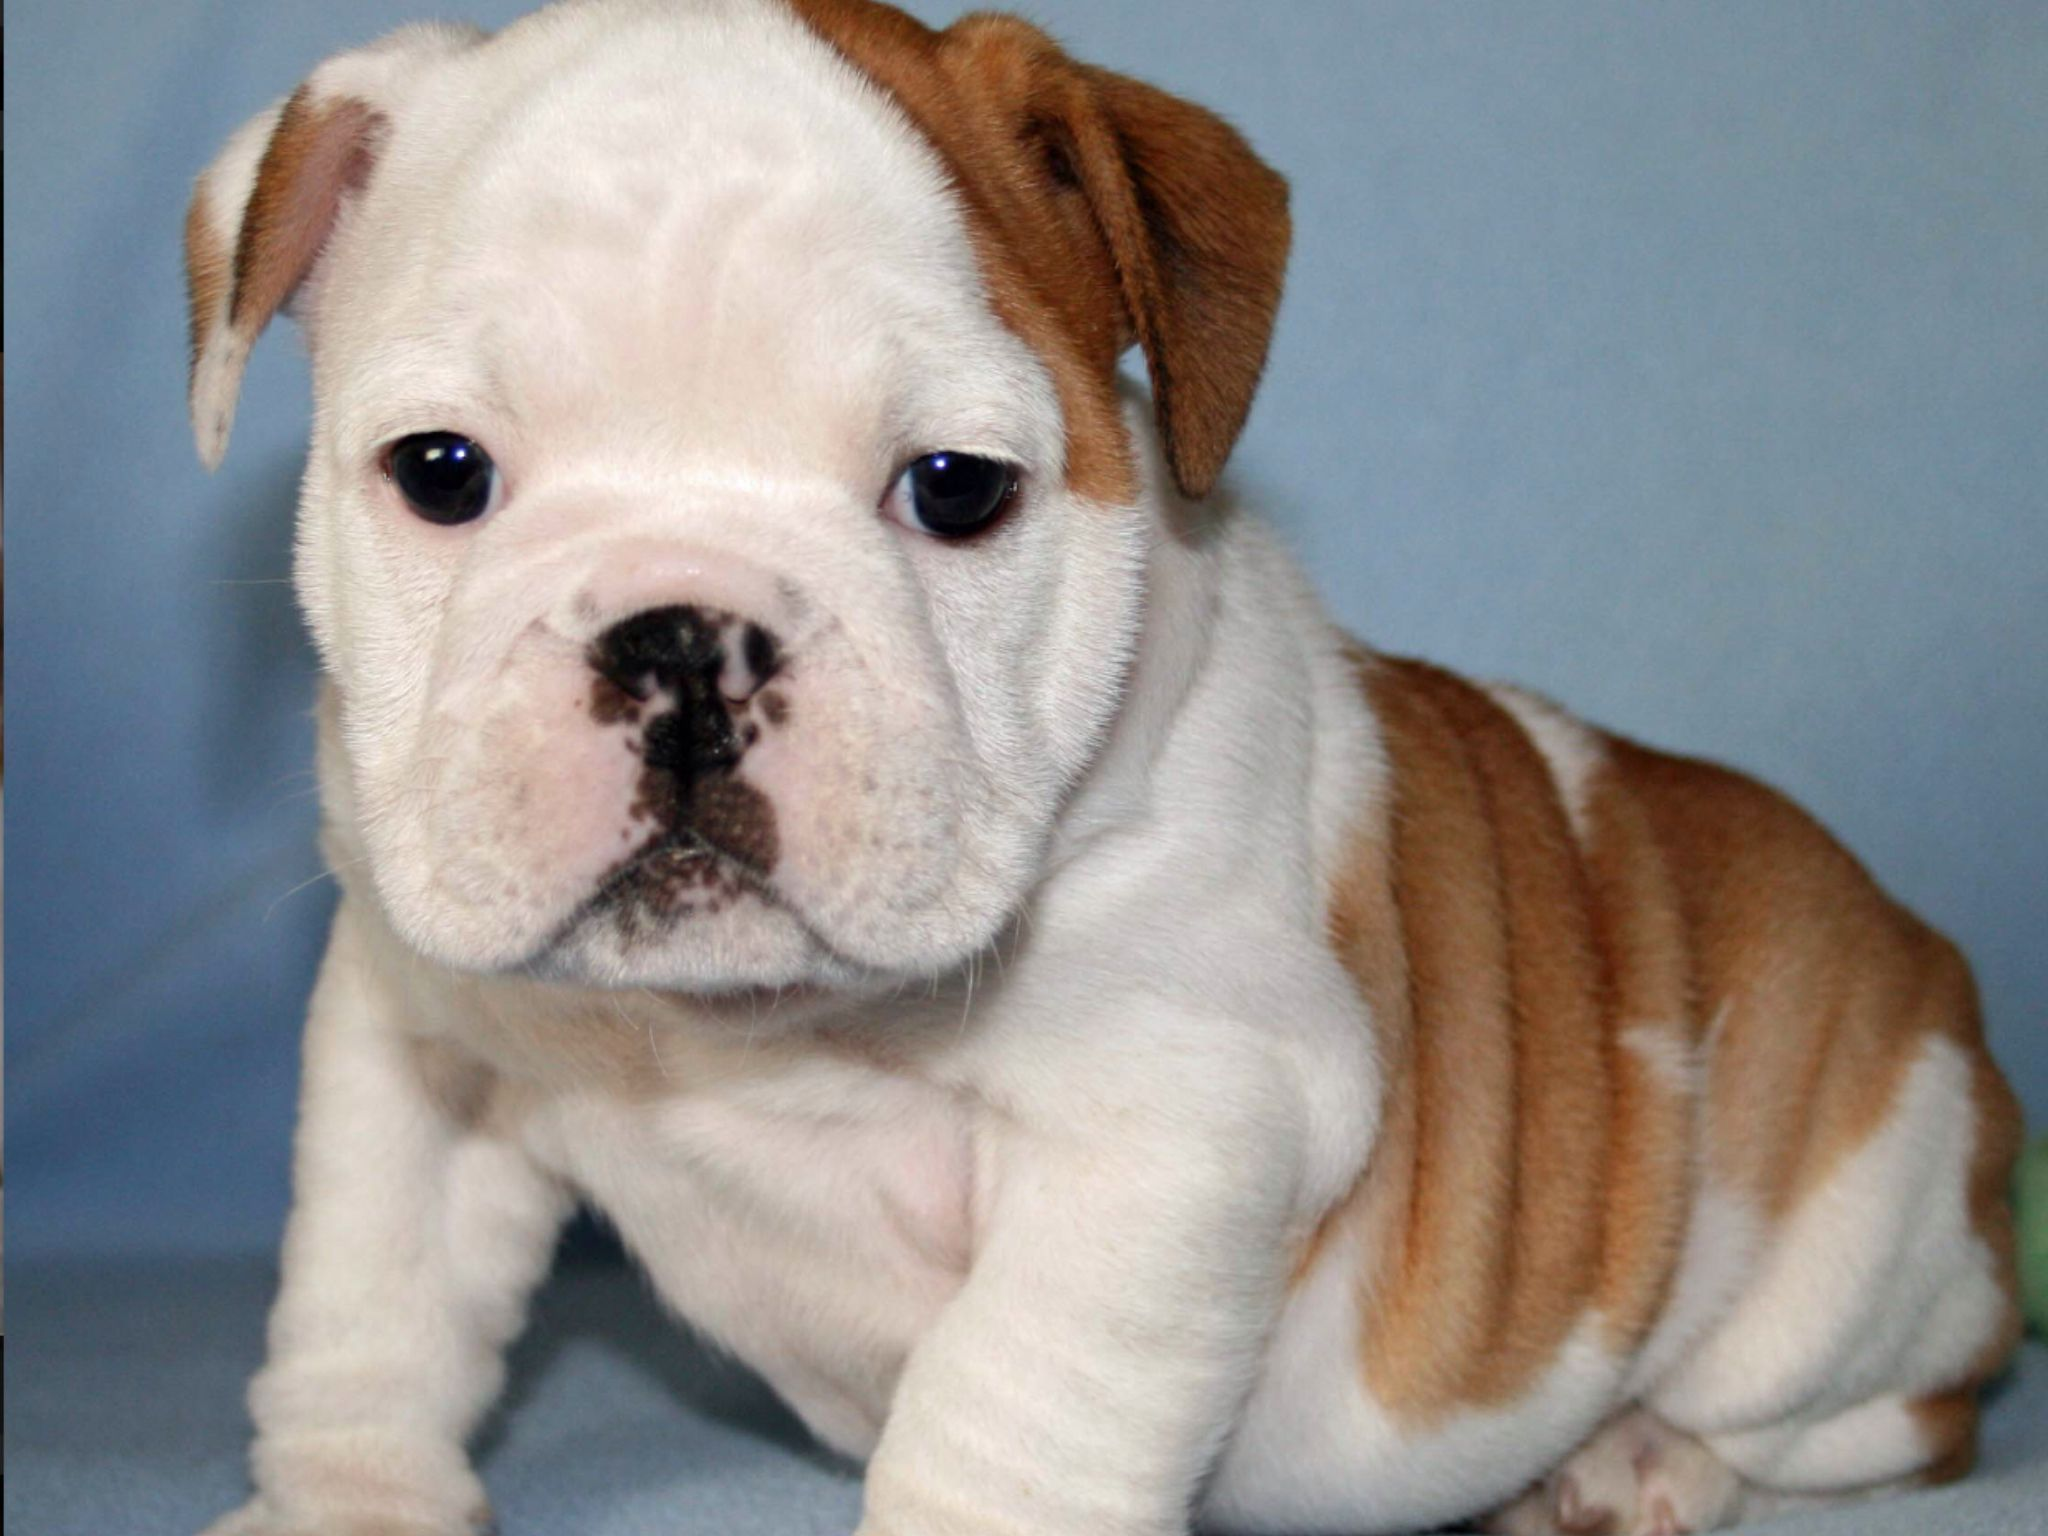 Super Duper Cute Puppy English Bulldog Puppies Bulldog Puppies